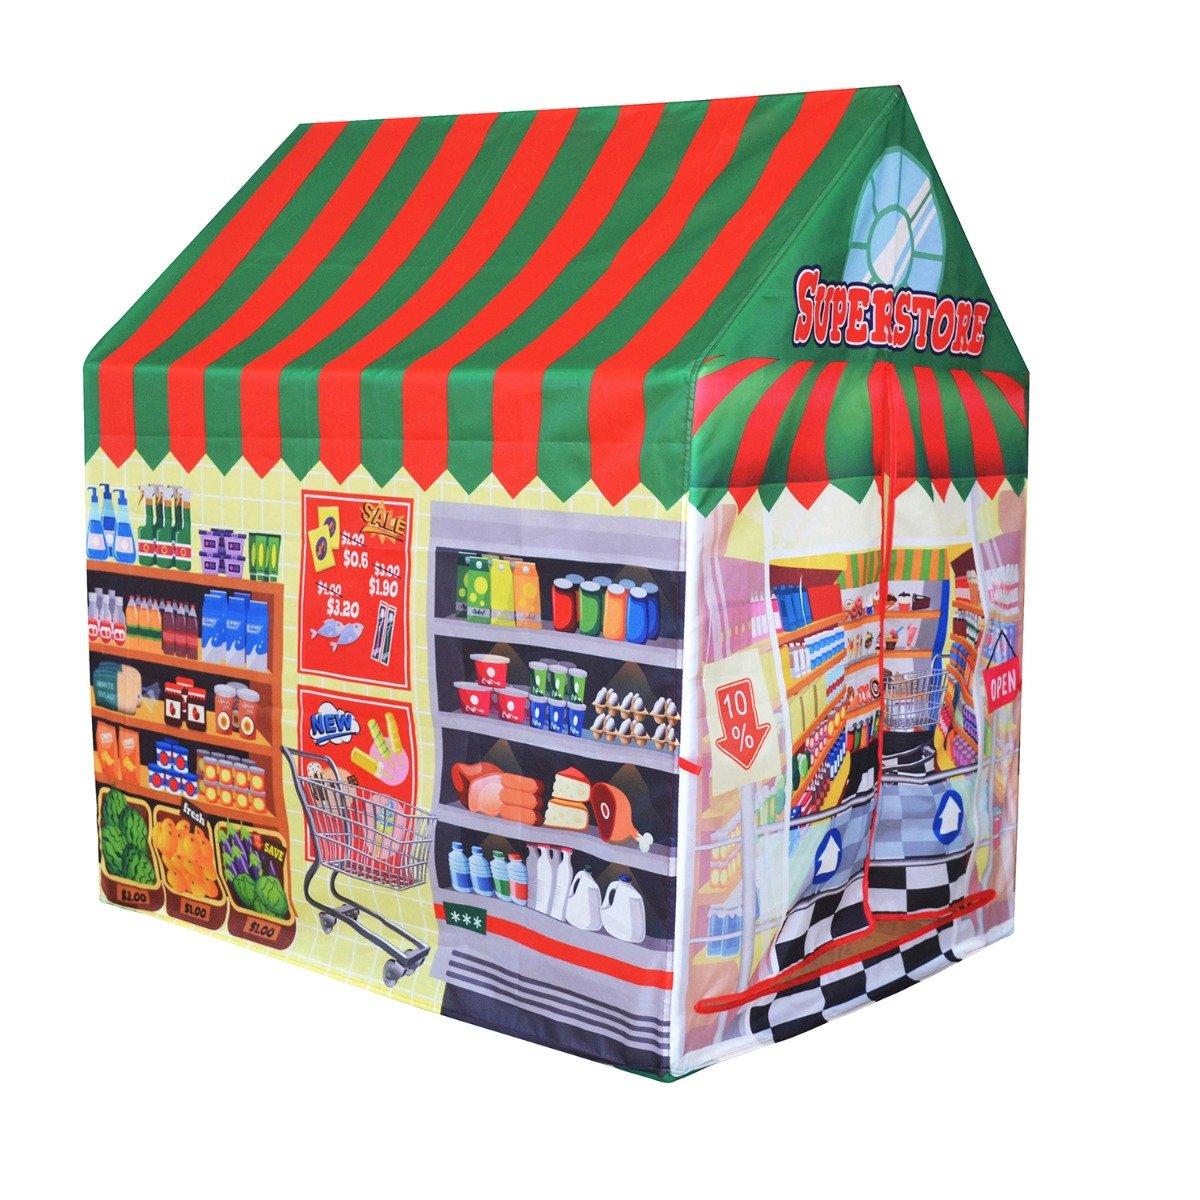 Cort pentru copii Iplay-Toys Superstore